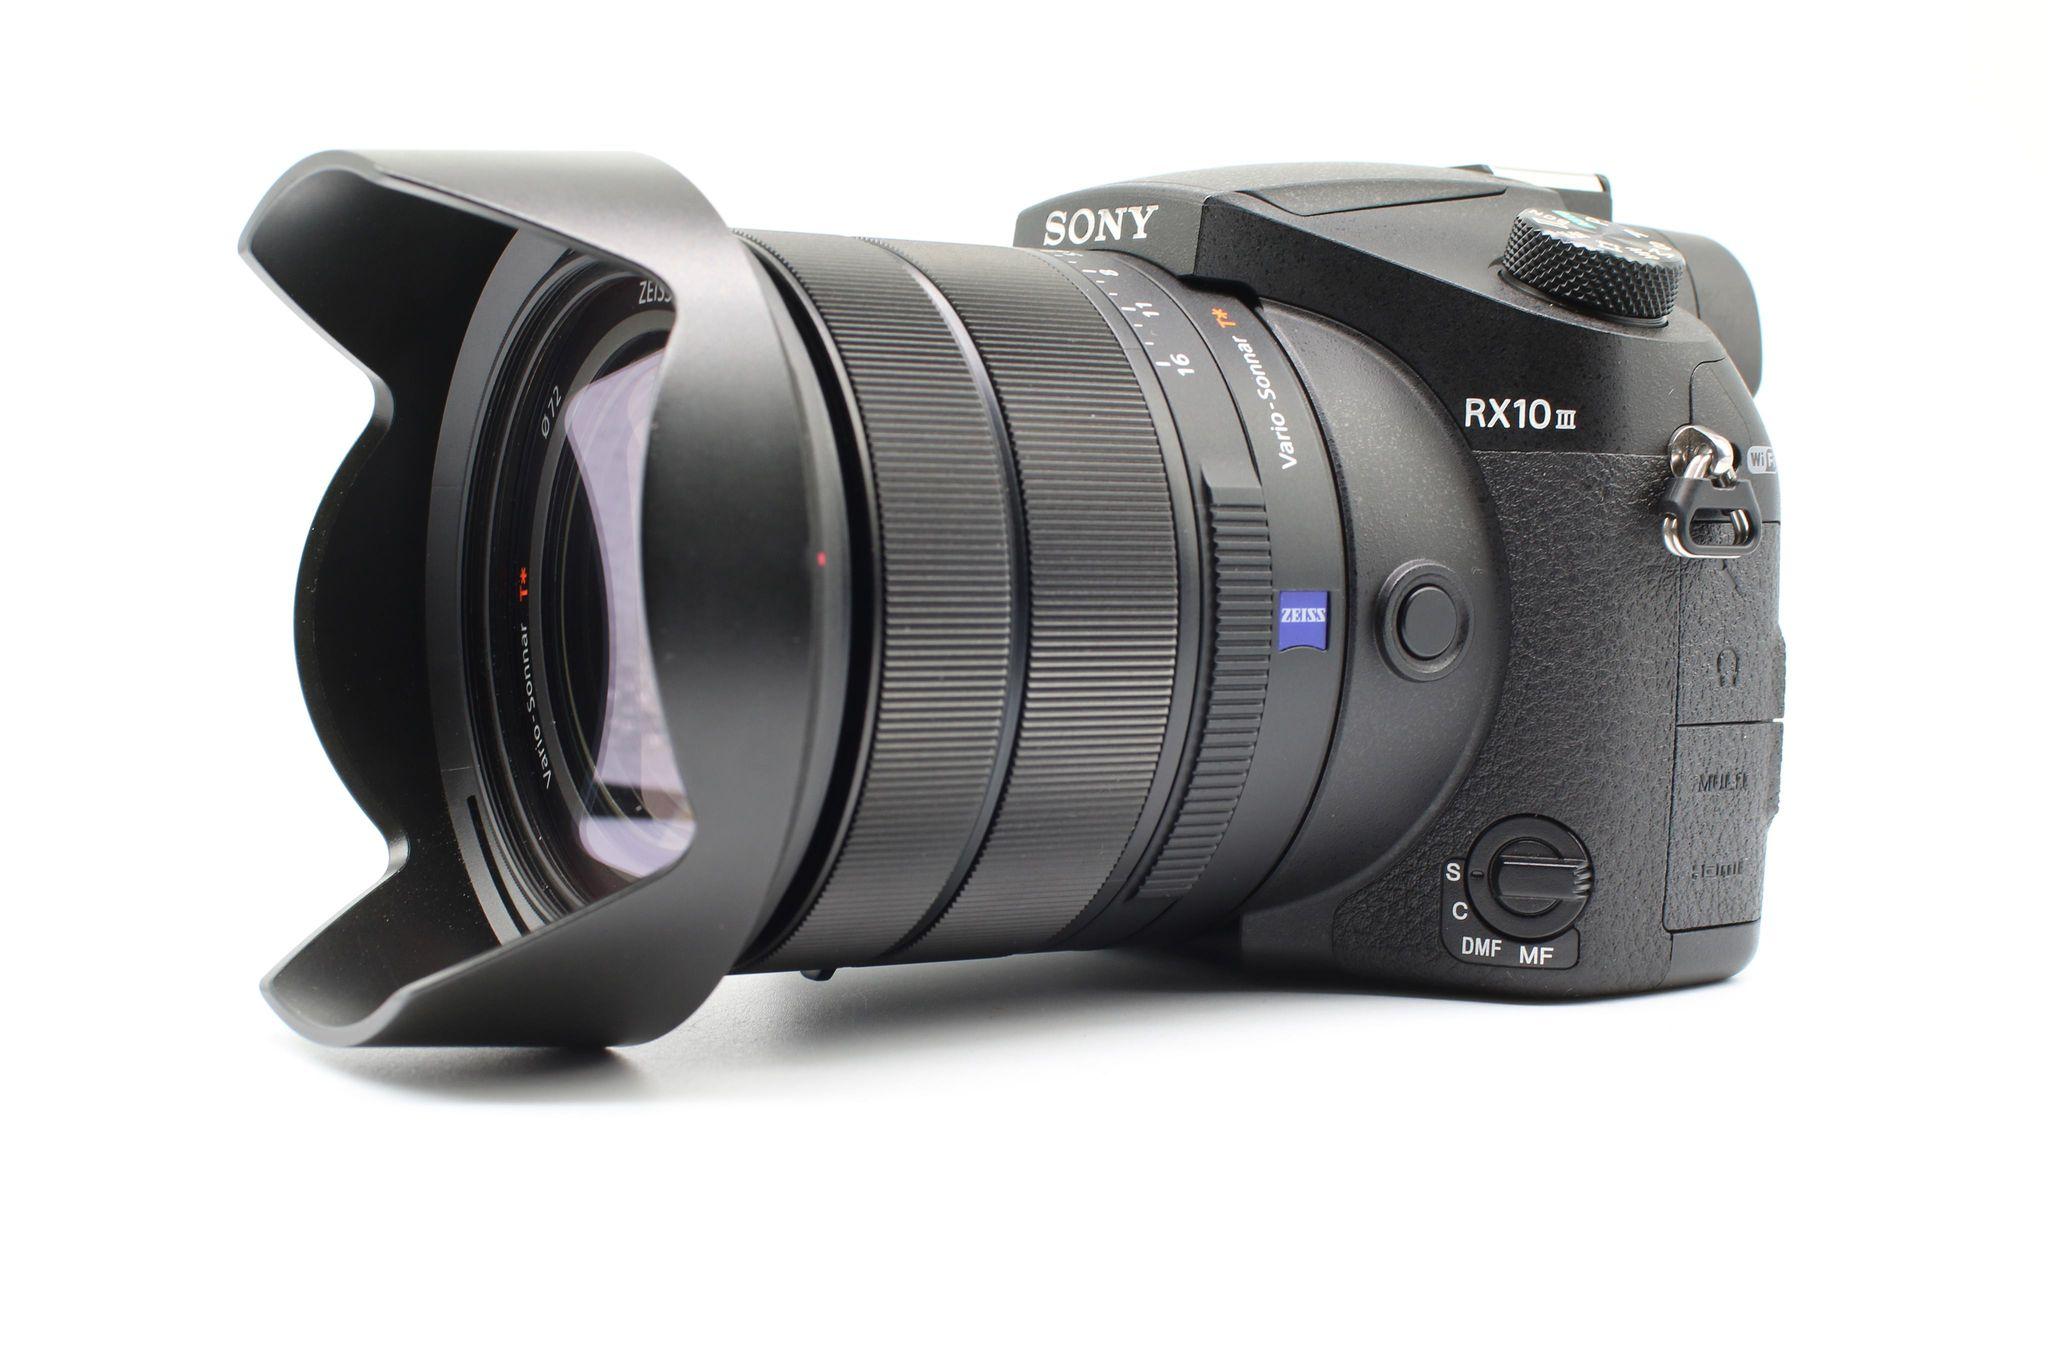 Máy ảnh Sony Cyber-shot DSC-RX10 Mark III, Mới 98%